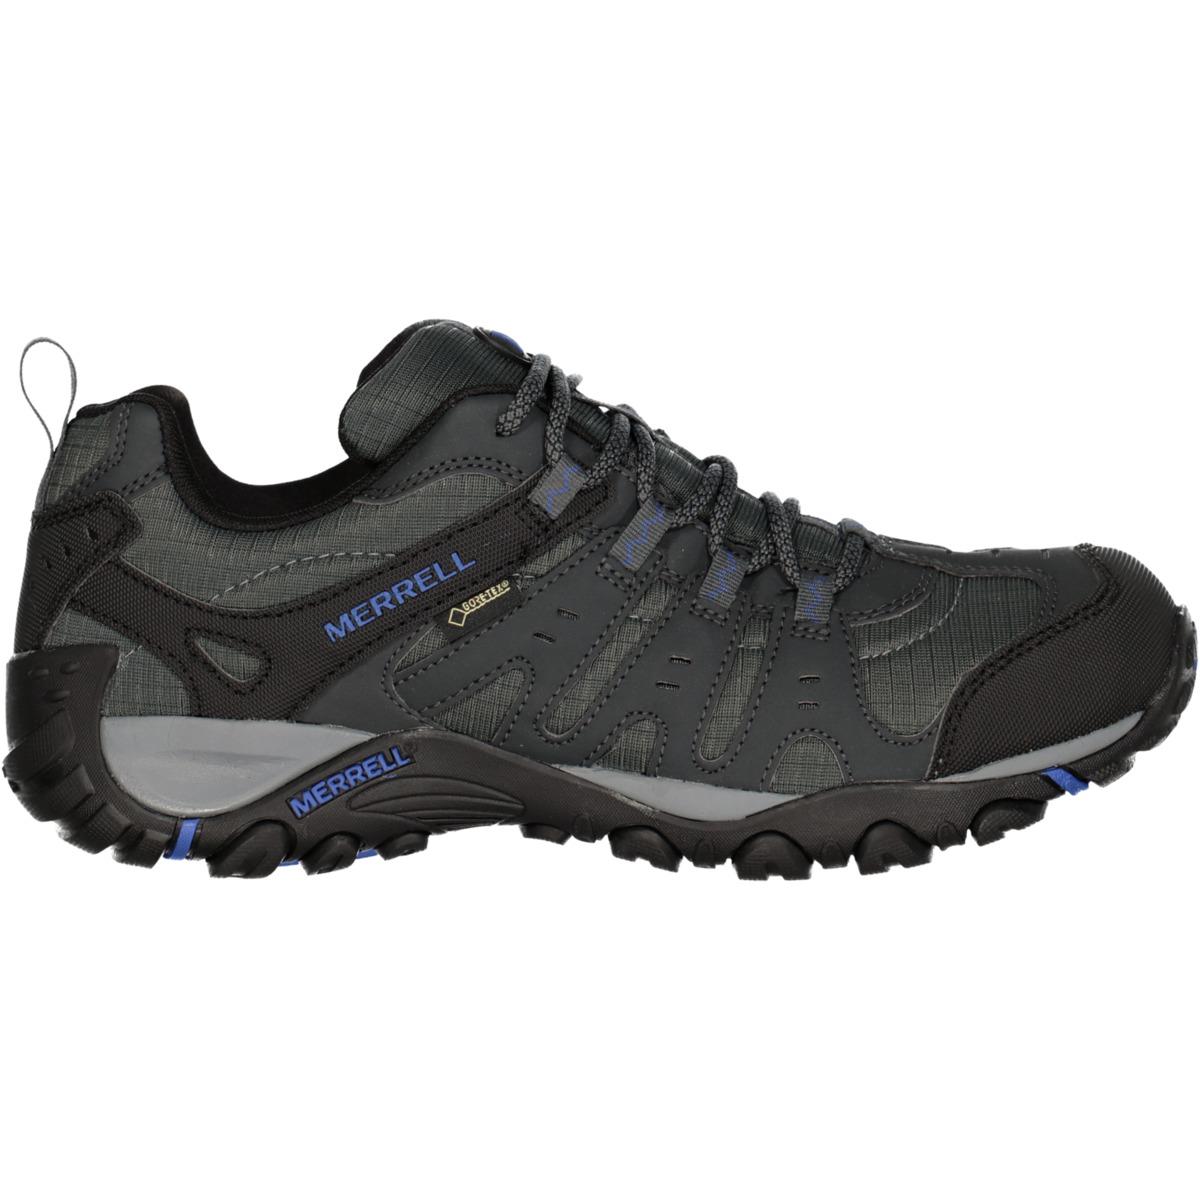 Accentor sport GTX, hikingsko herre